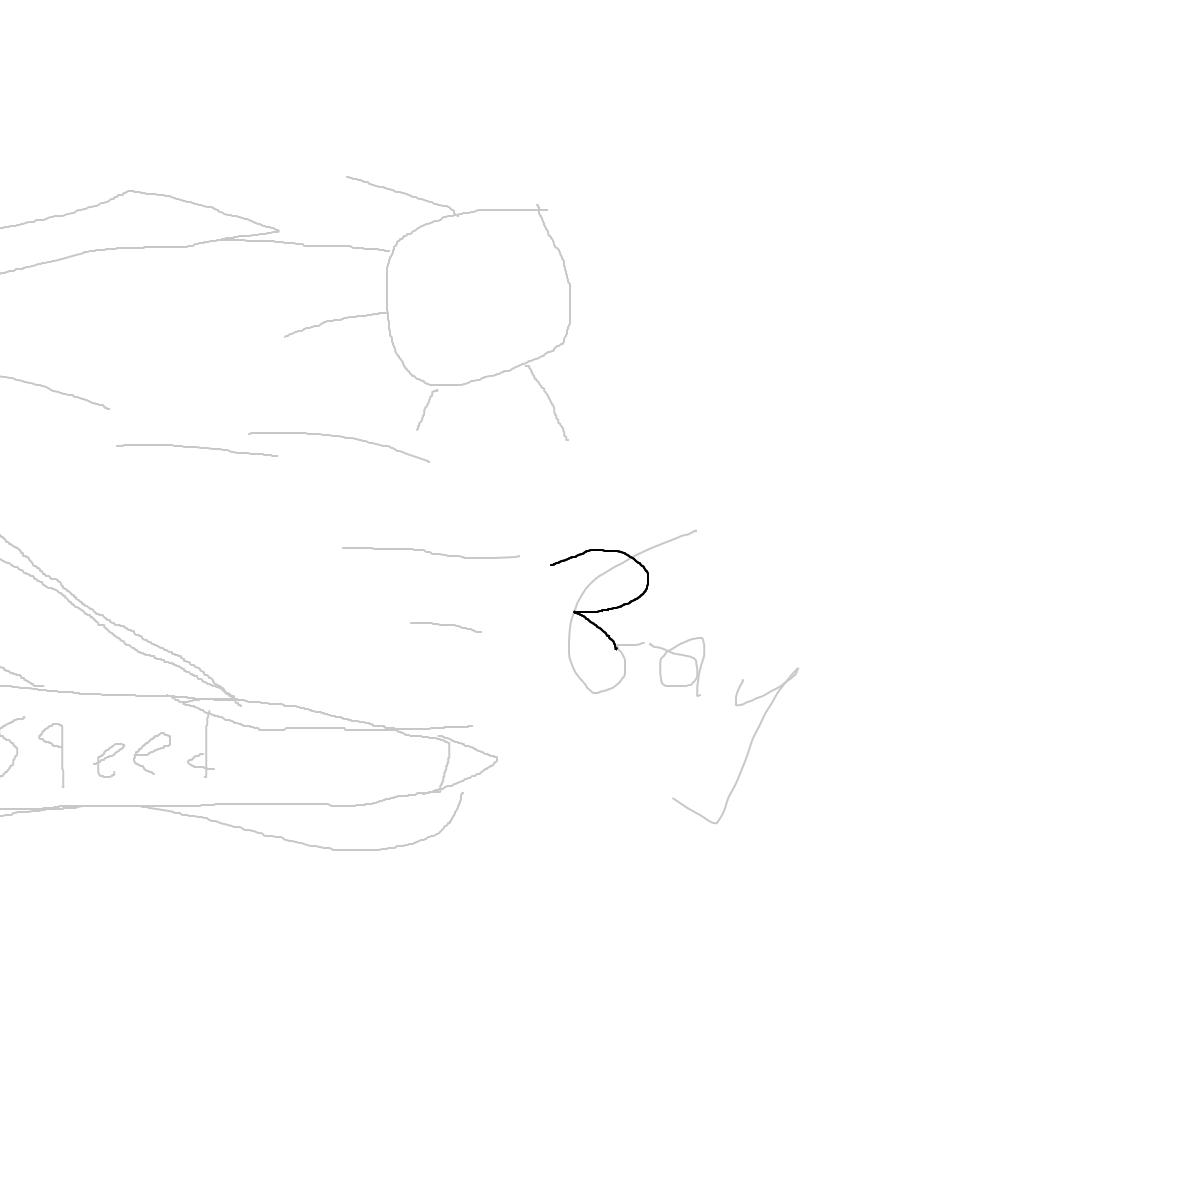 BAAAM drawing#5166 lat:44.2246971130371100lng: -76.4820480346679700